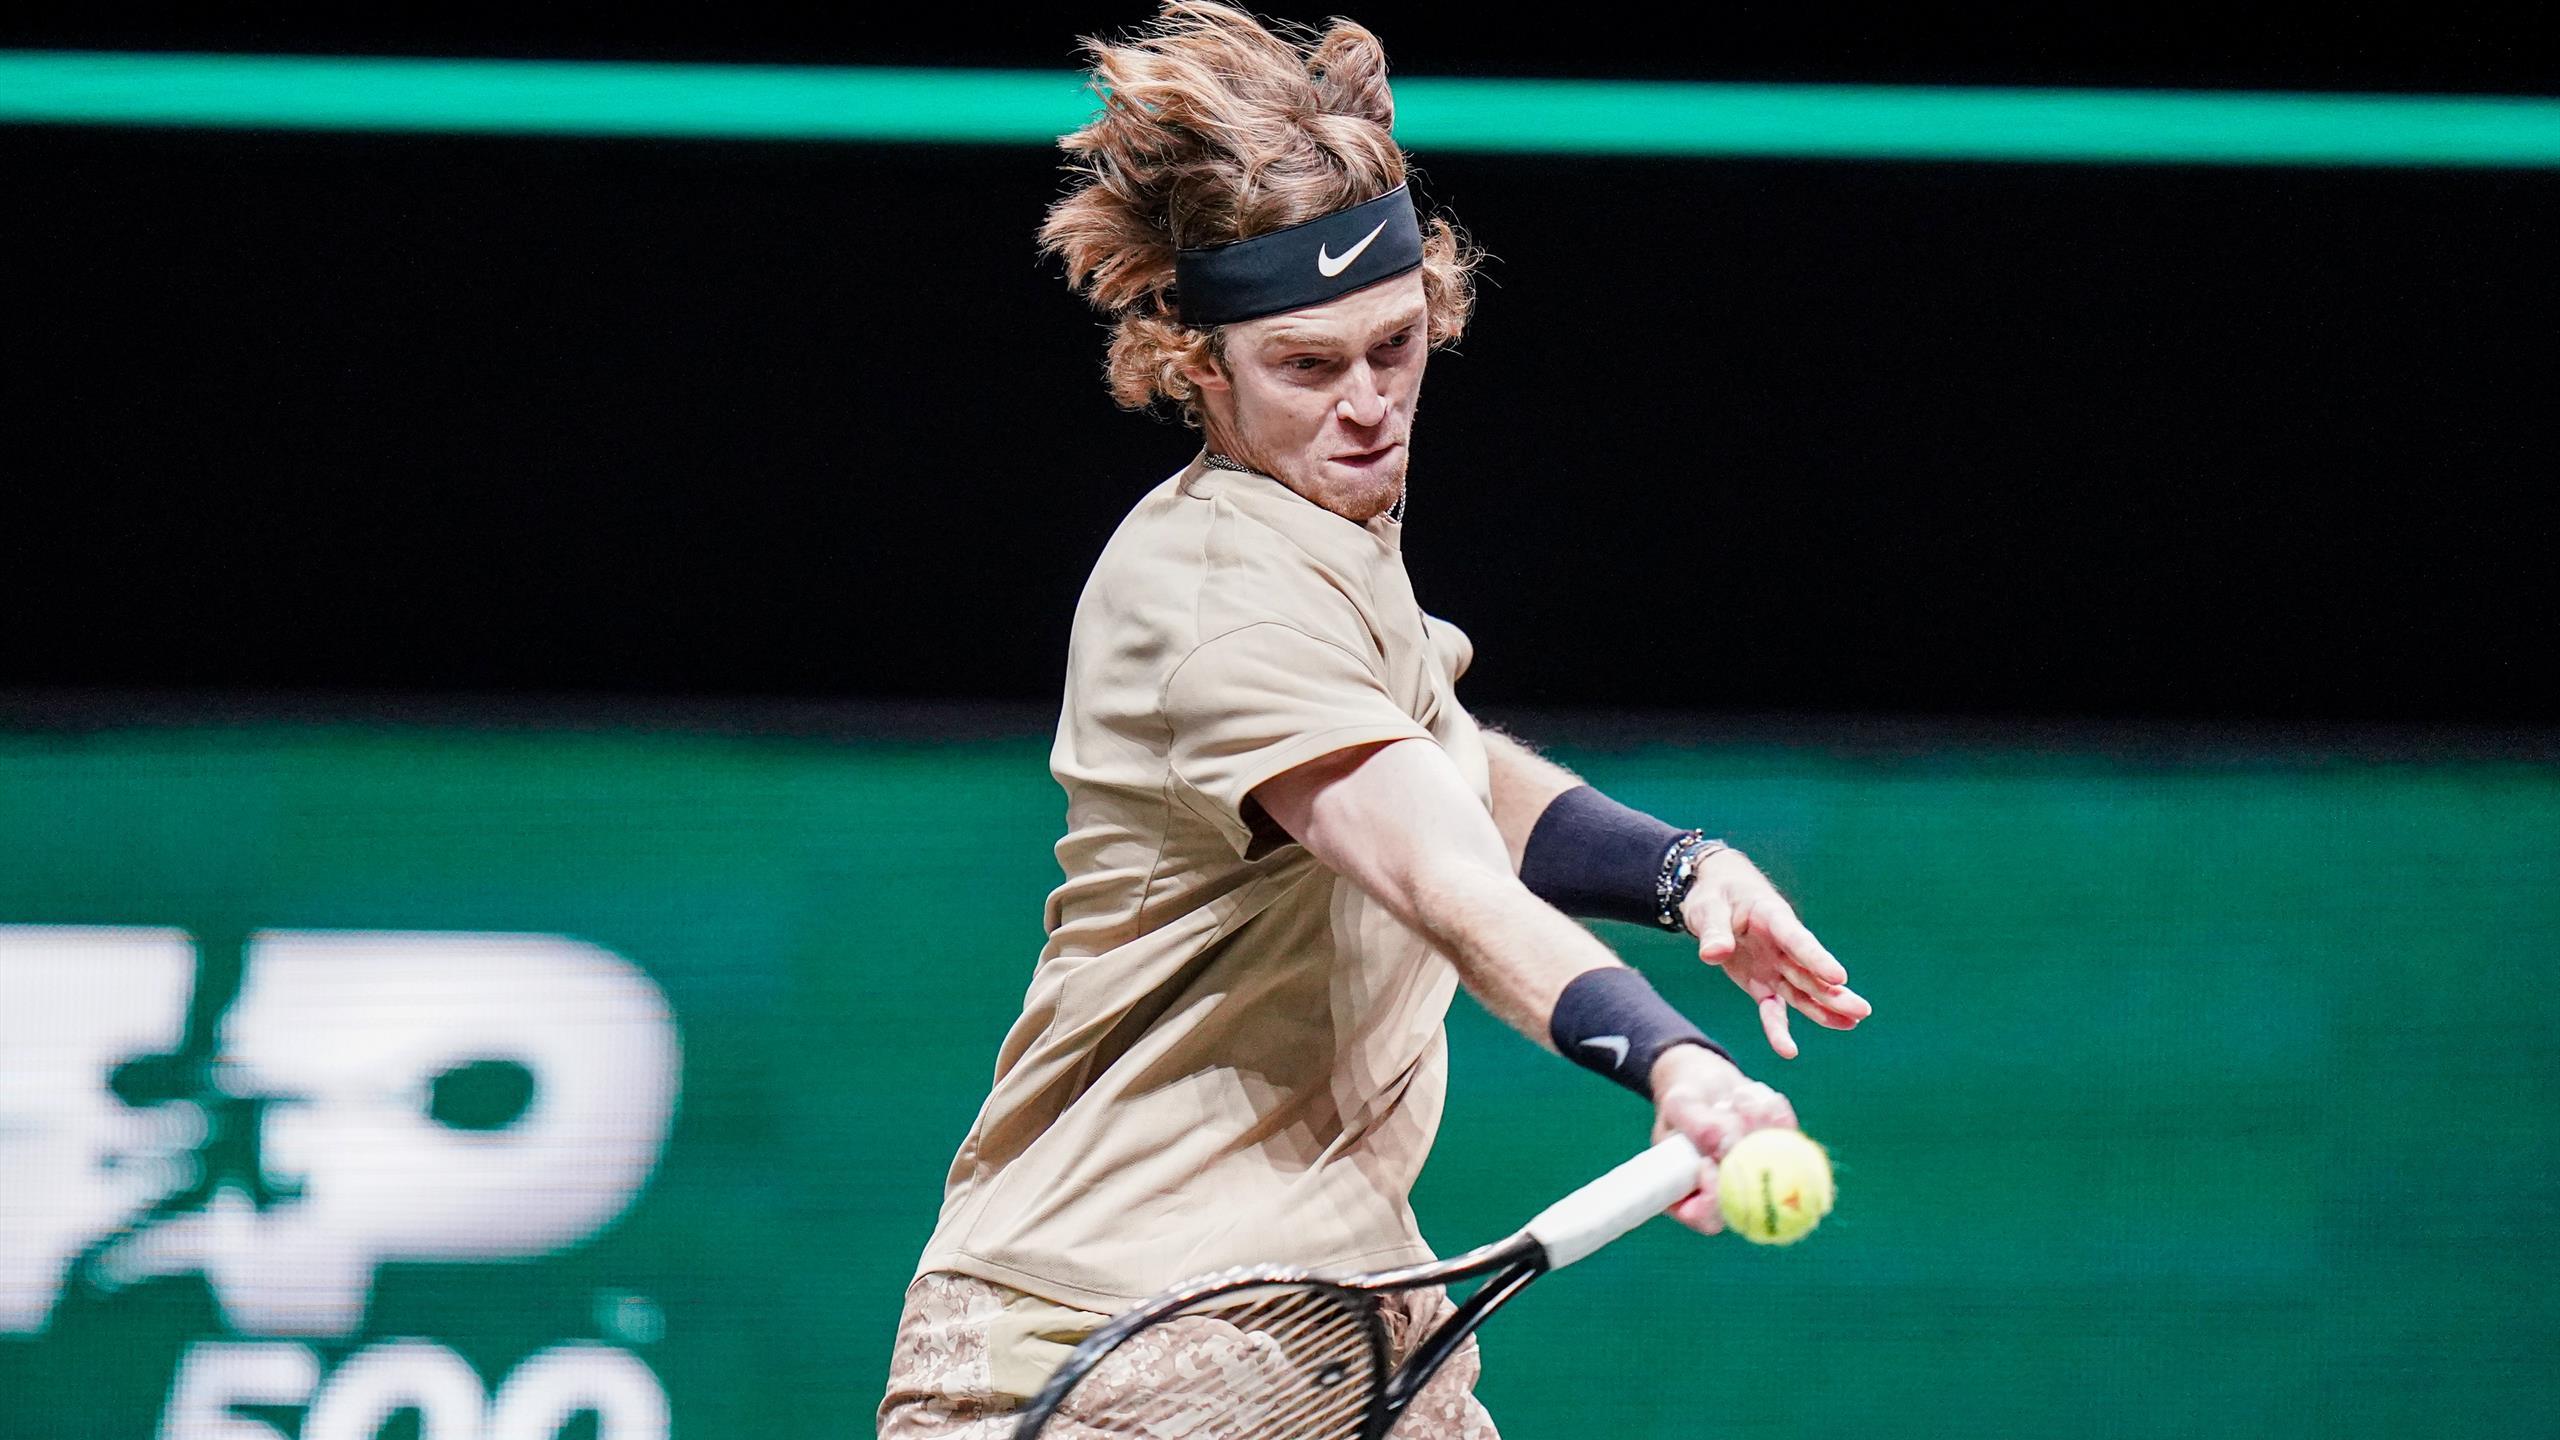 ATP Rotterdam : Andrey Rublev domine Stefanos Tsitsipas (6-3, 7-6) en demi-finale - Eurosport FR